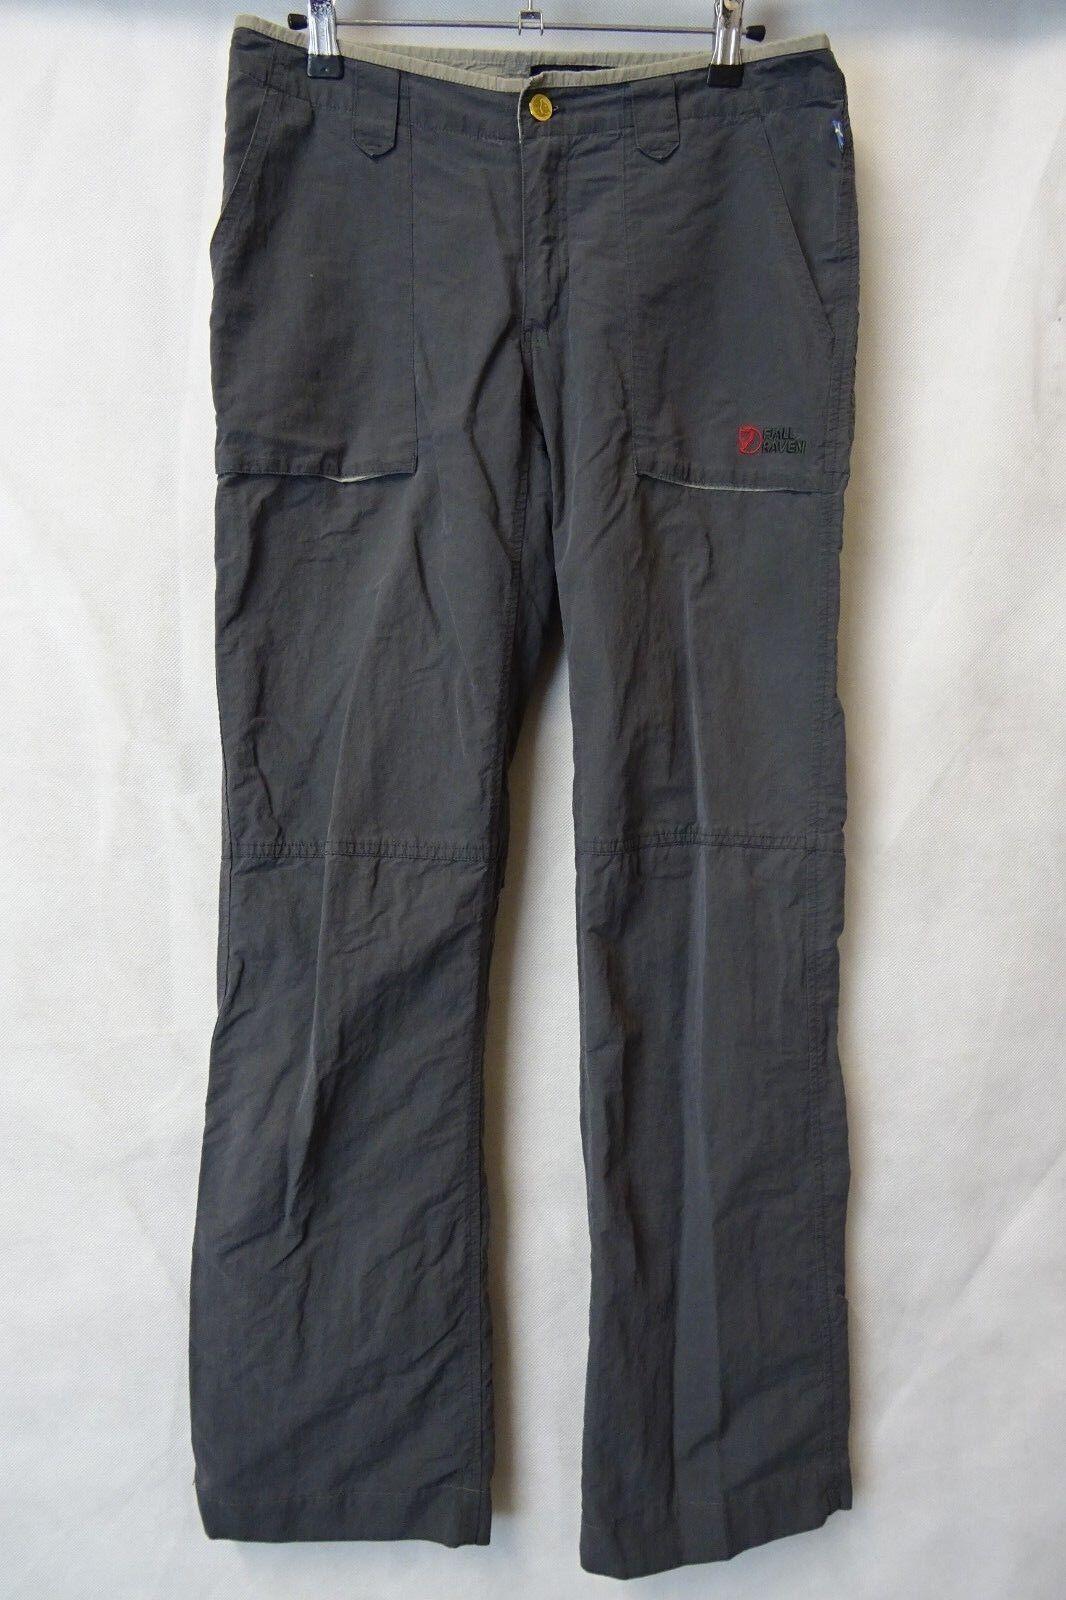 Hommes FJALLRAVEN Pantalon Outdoor Combat Trekking Combat Outdoor Taille W30 L31 AA2562 41c622